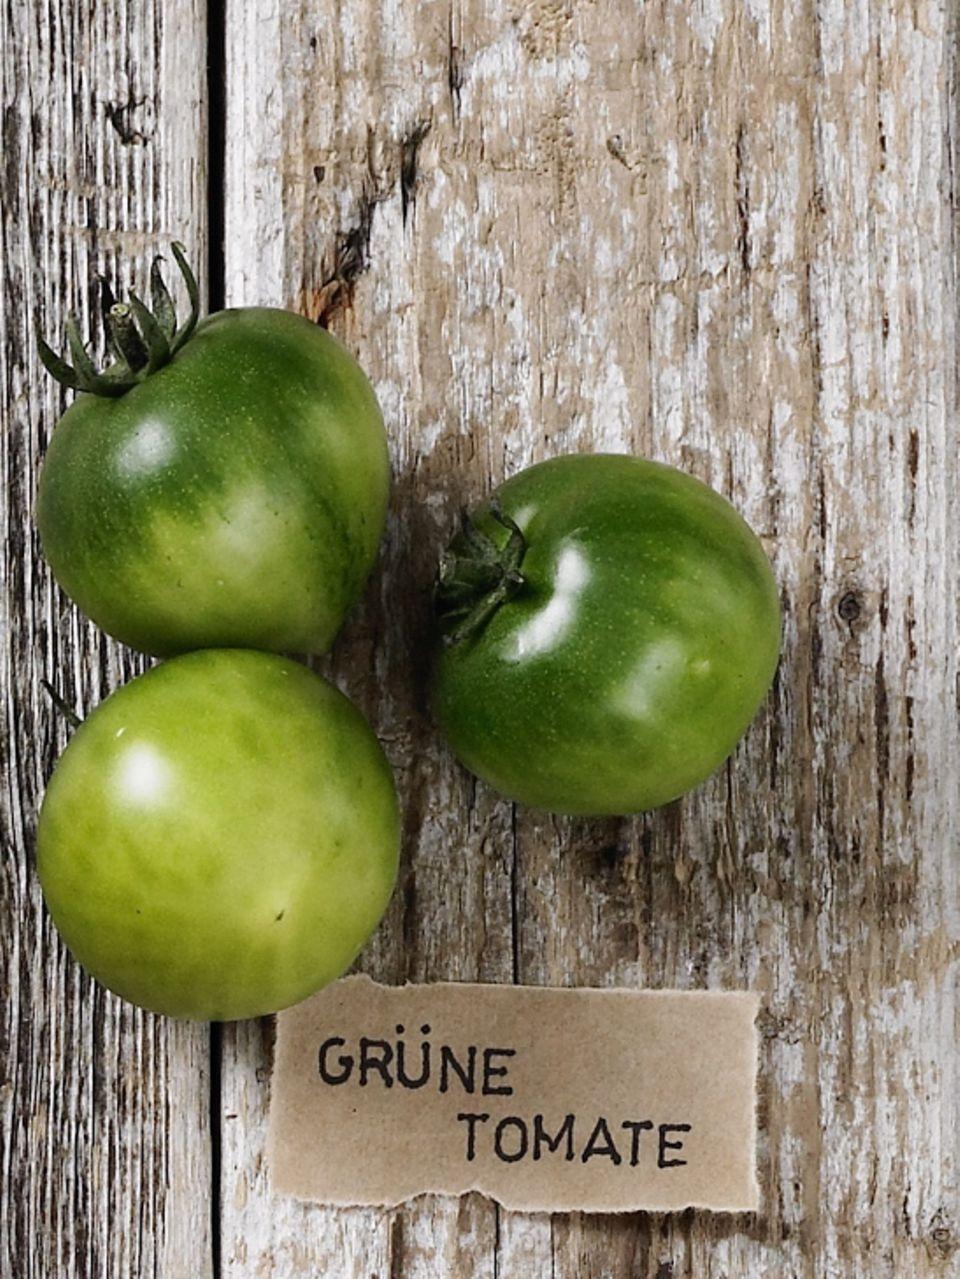 Tomatensorte Grüne Tomaten